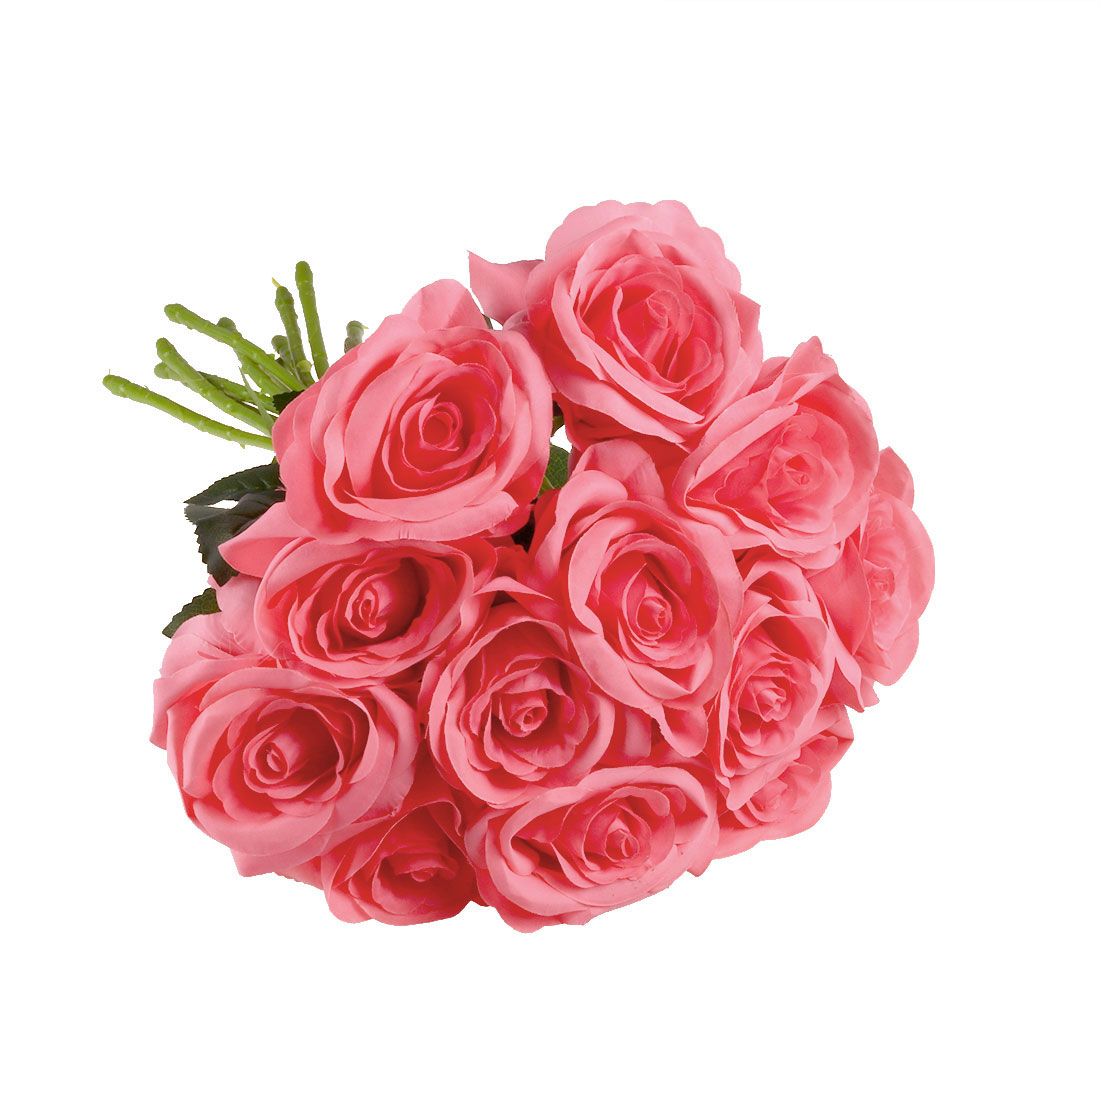 Artificial Silk Vintage Rose Flowers Bouquet Wedding Home Decoration